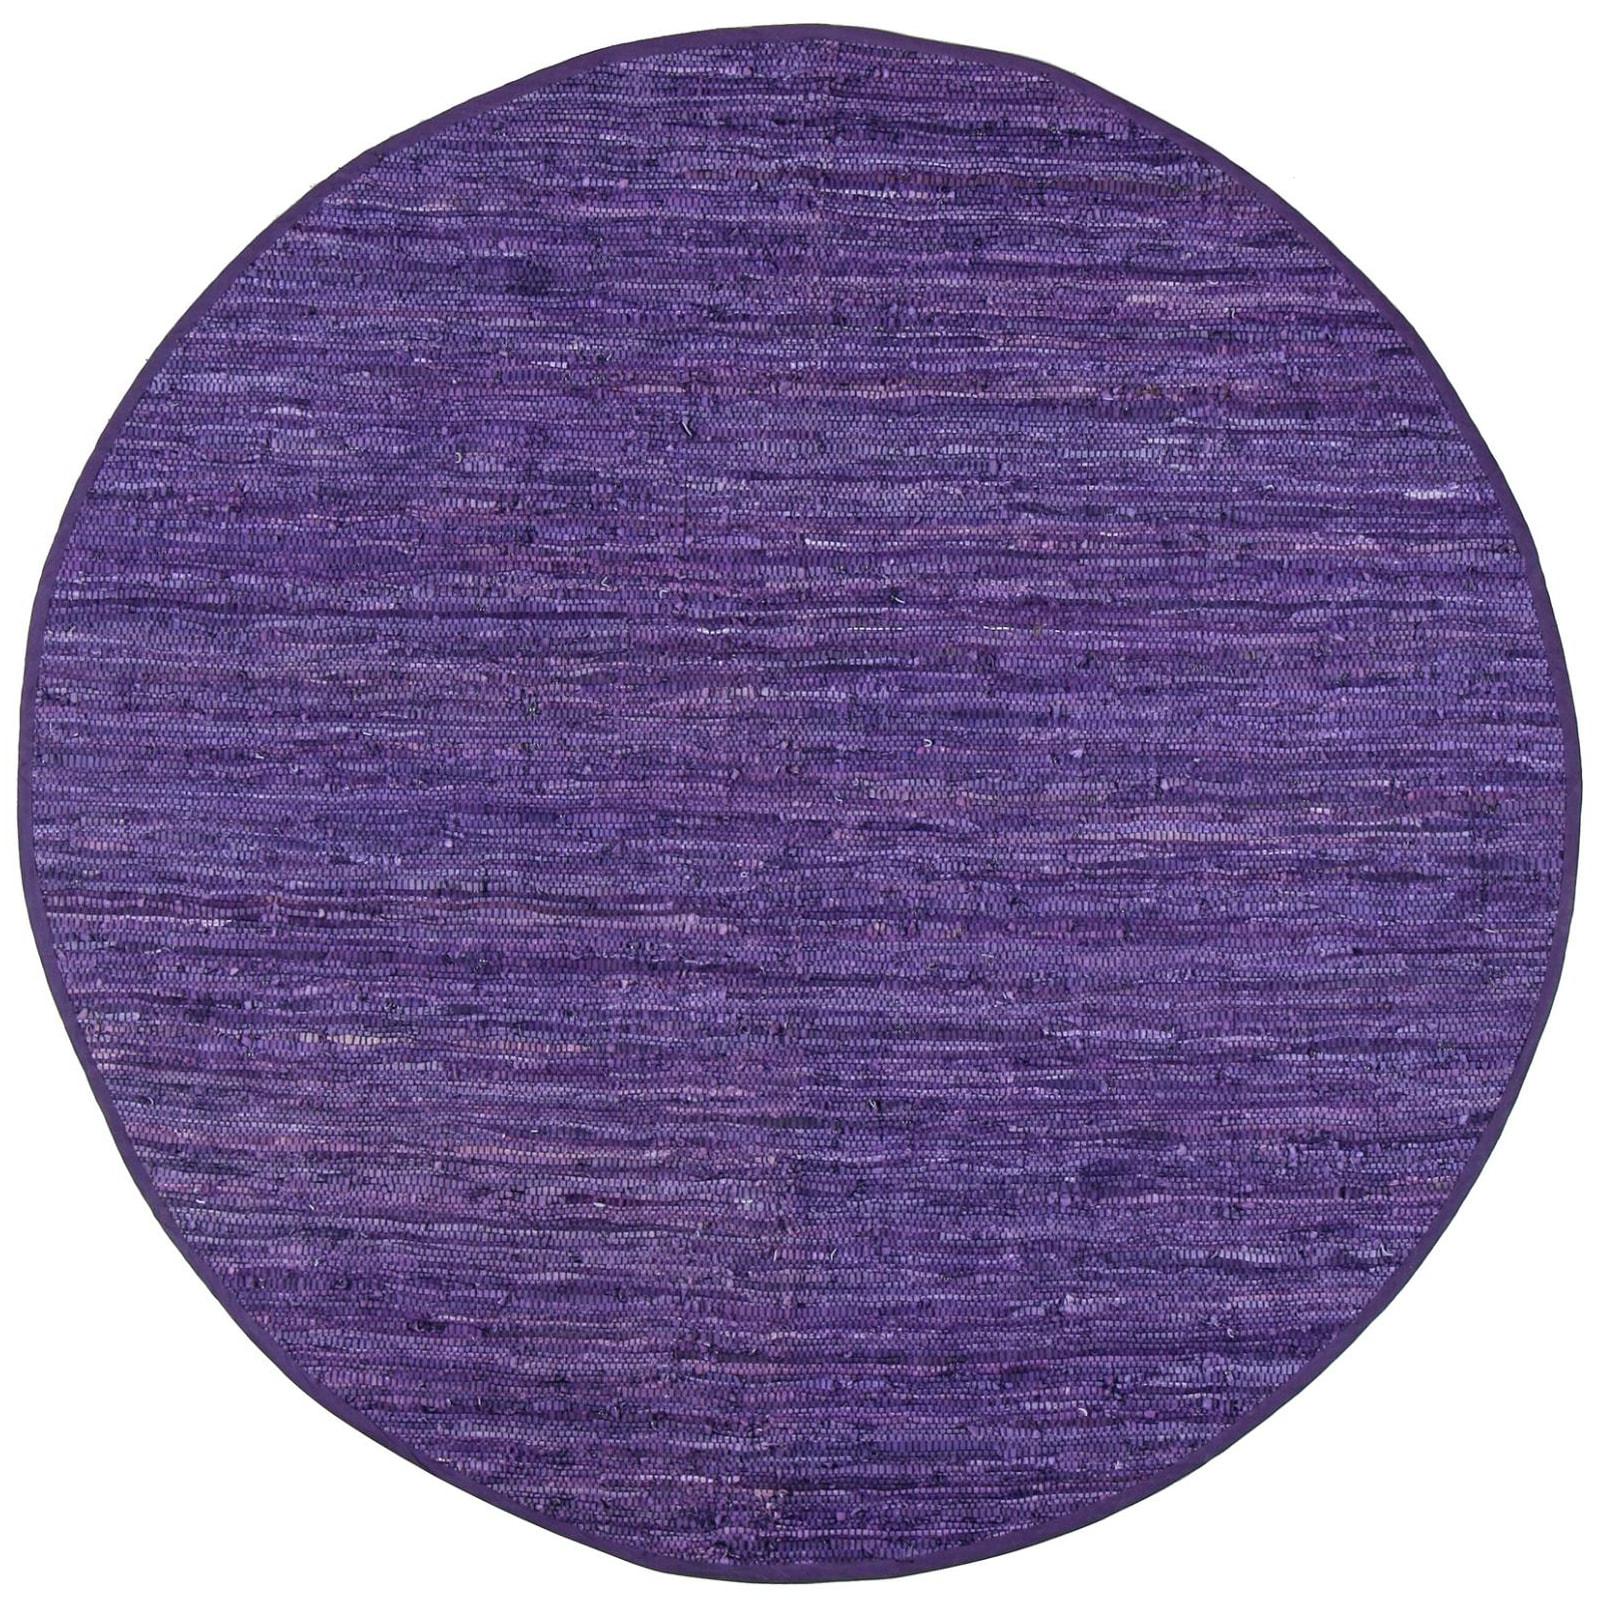 Purple Circle Rugs: Purple Round, Oval, & Square Area Rugs